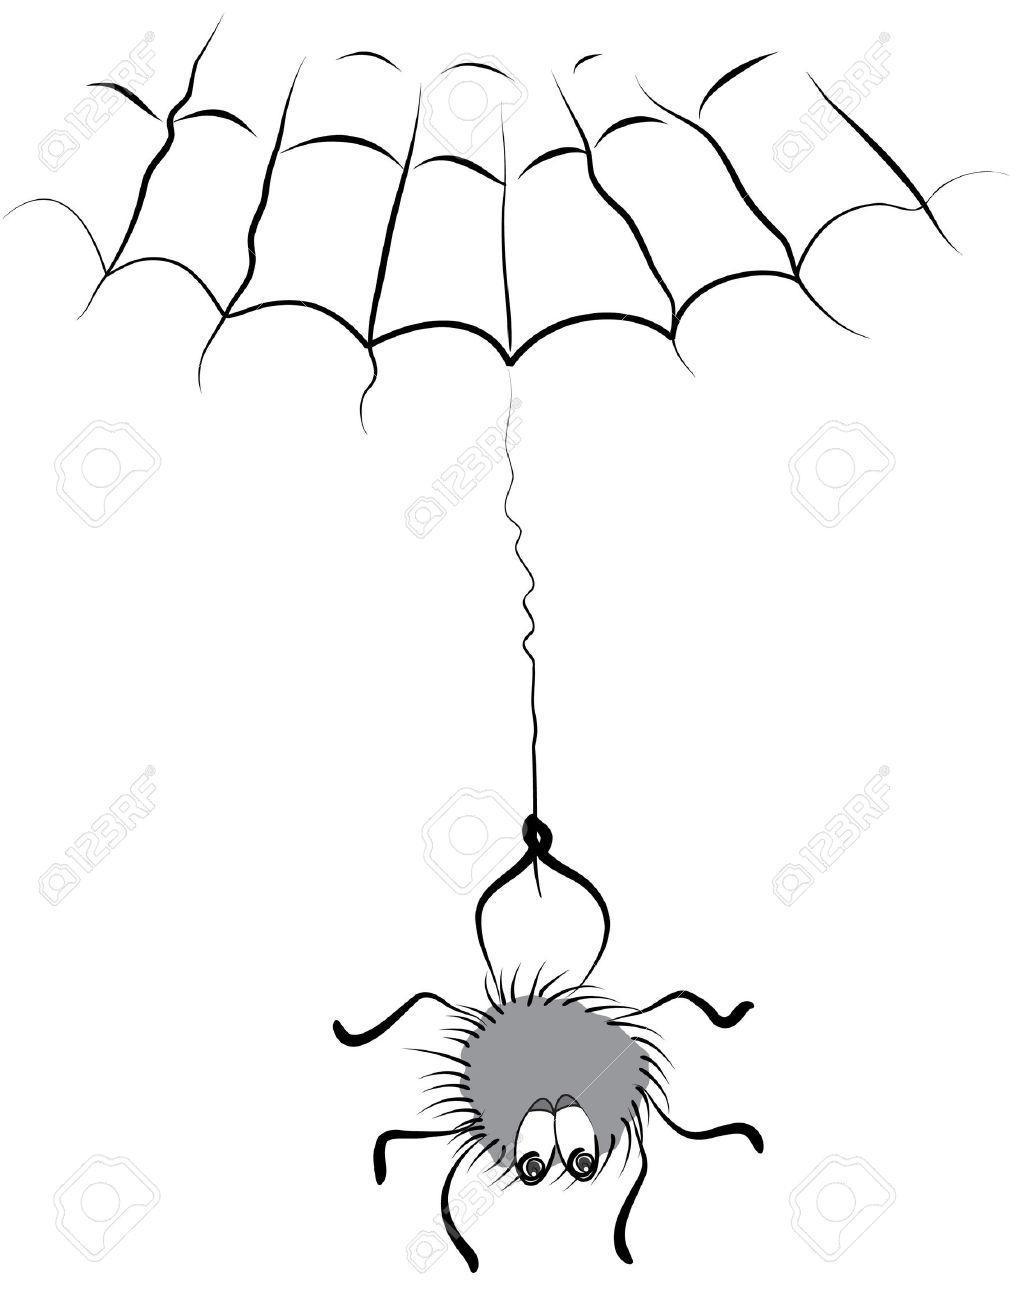 1016x1300 Cartoon Spider Drawing Hand Drawing Spider Cartoon Web Halloween